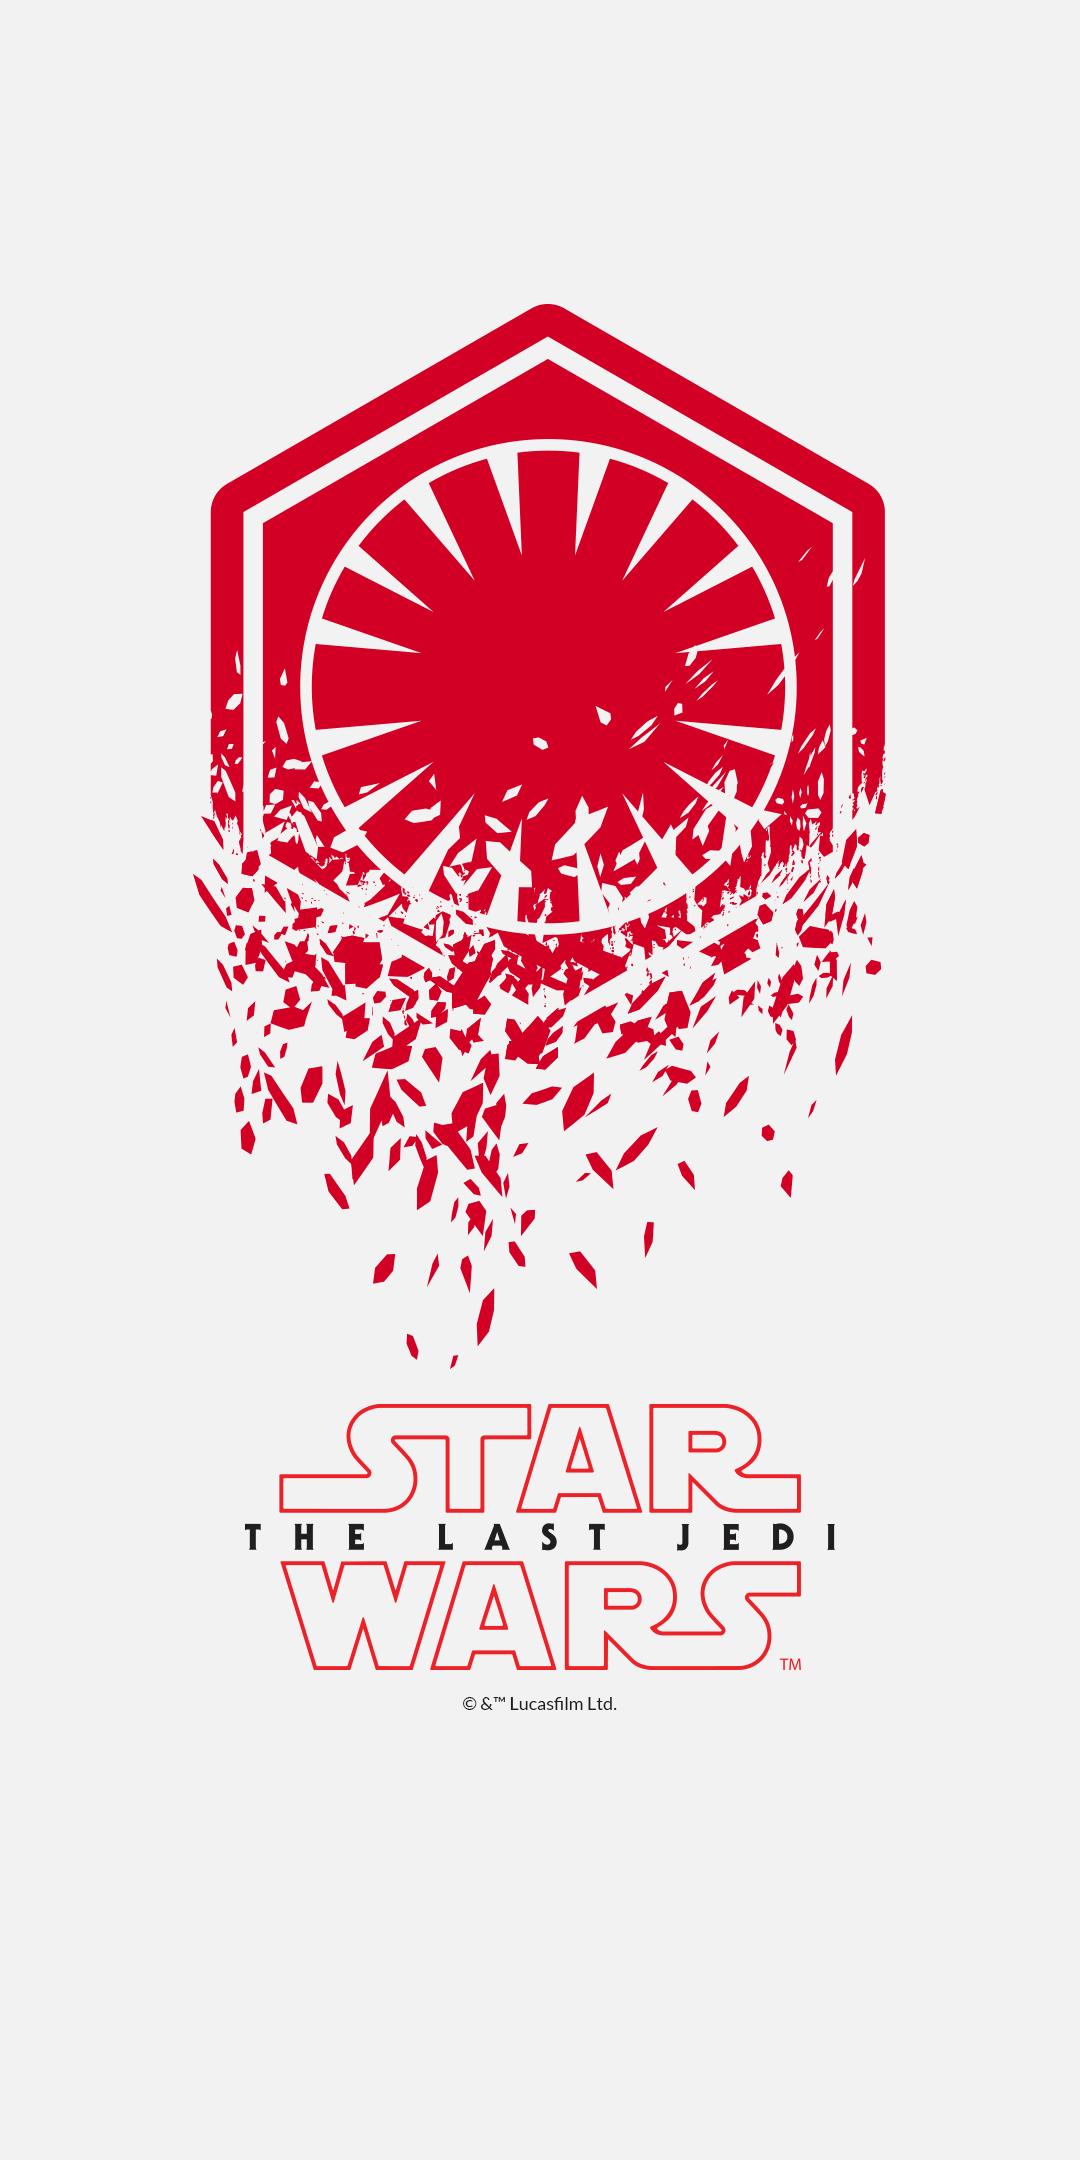 OnePlus 5T Star Wars The Last Jedi wallpapers download 1080x2160